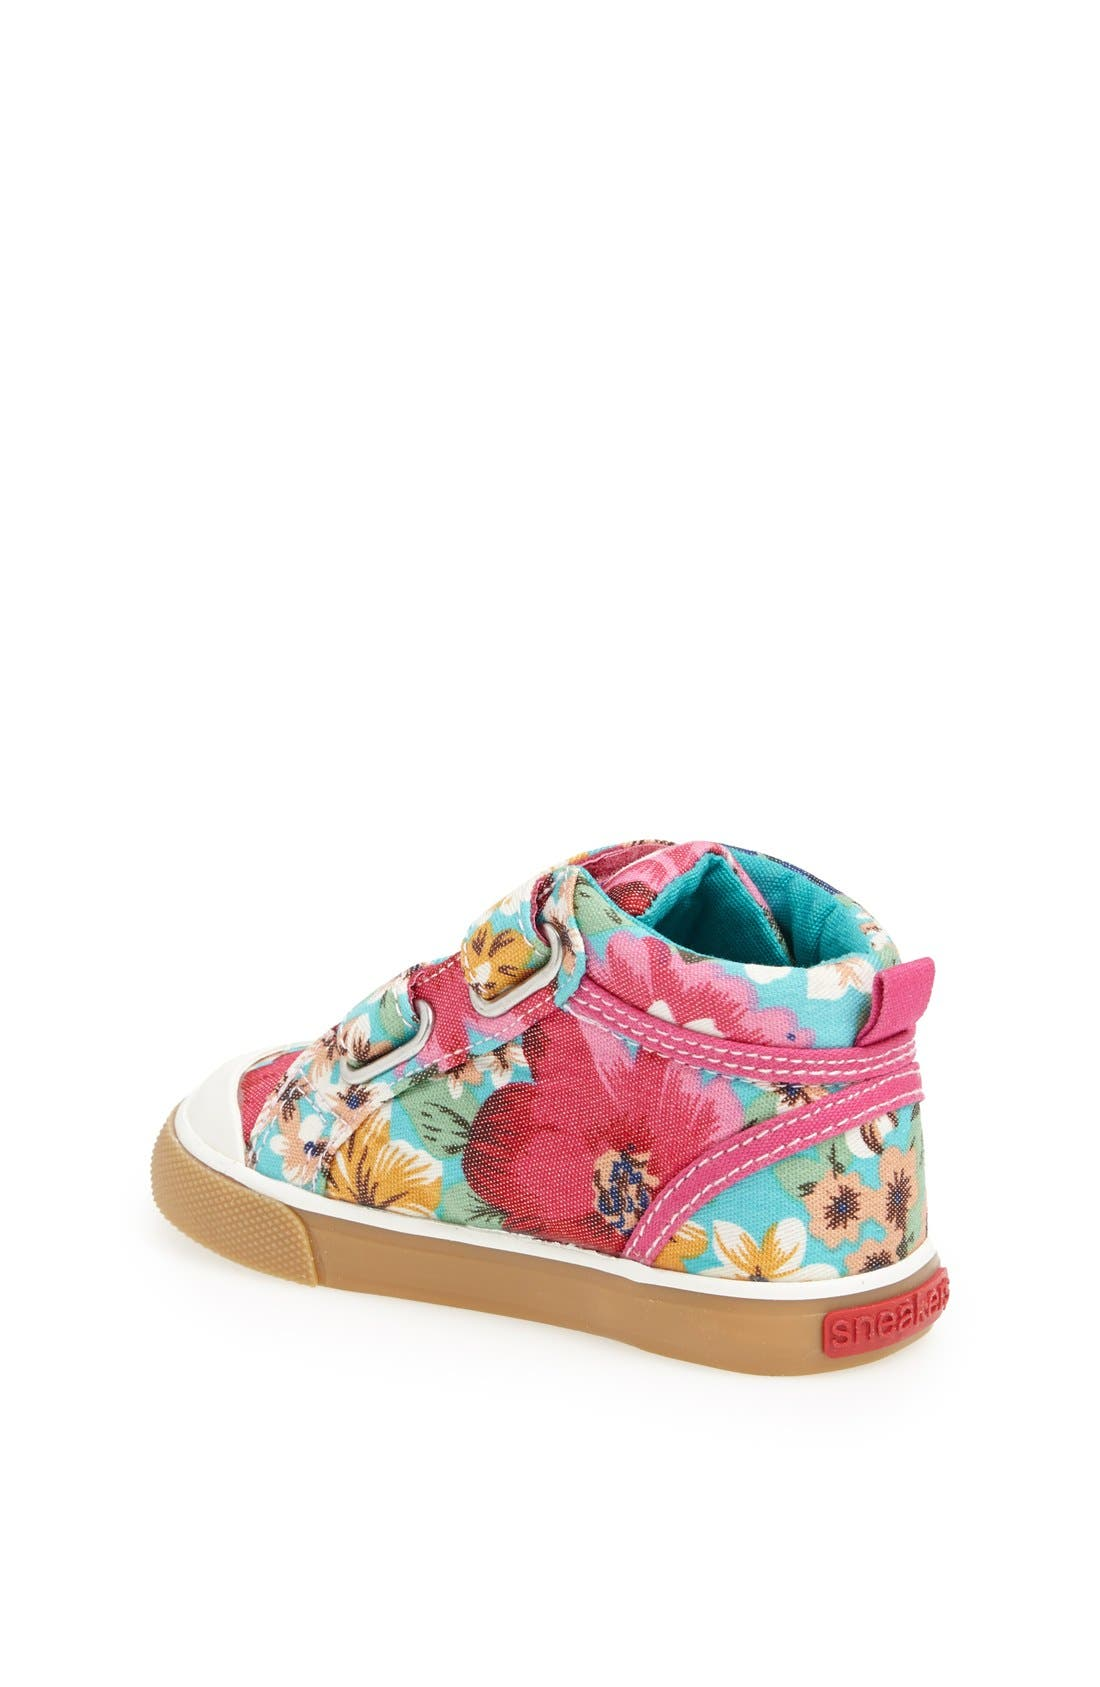 Alternate Image 2  - See Kai Run 'Caitlyn' High Top Sneaker (Baby, Walker & Toddler)